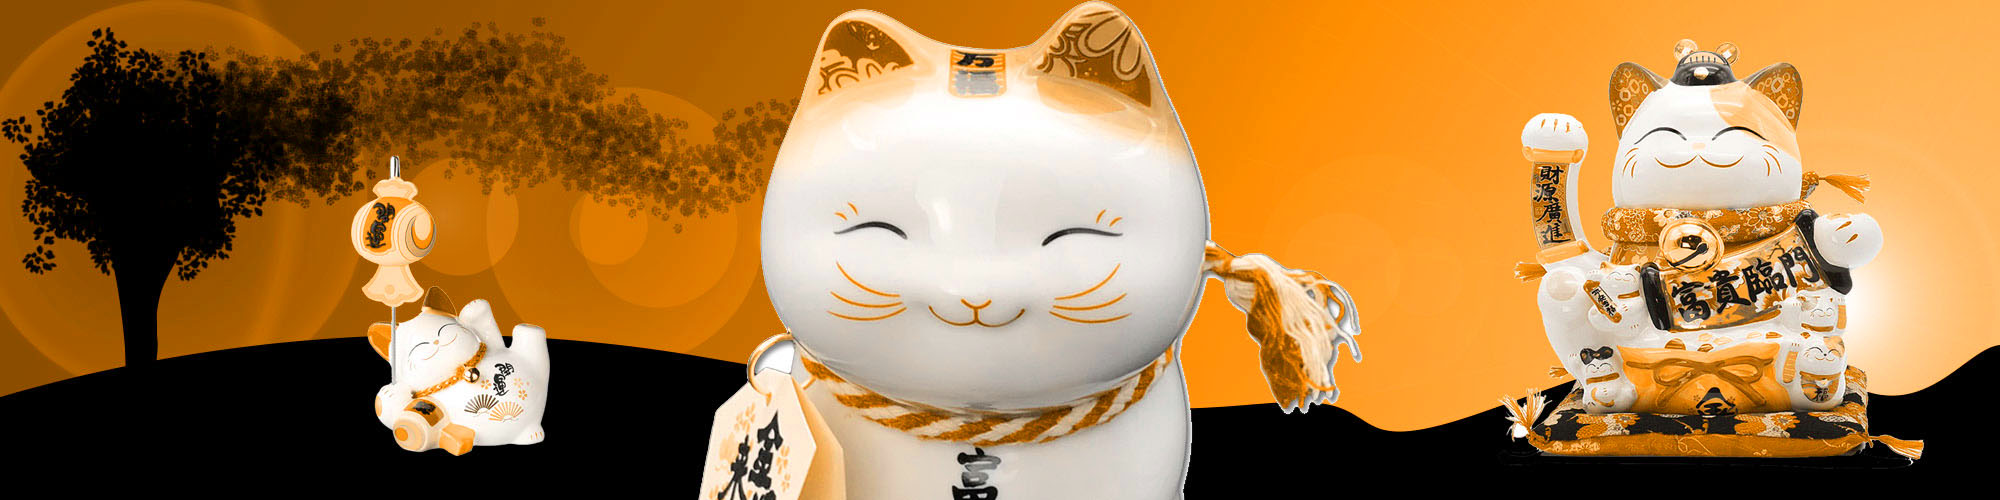 Adoptes ton chat porte-bonheur